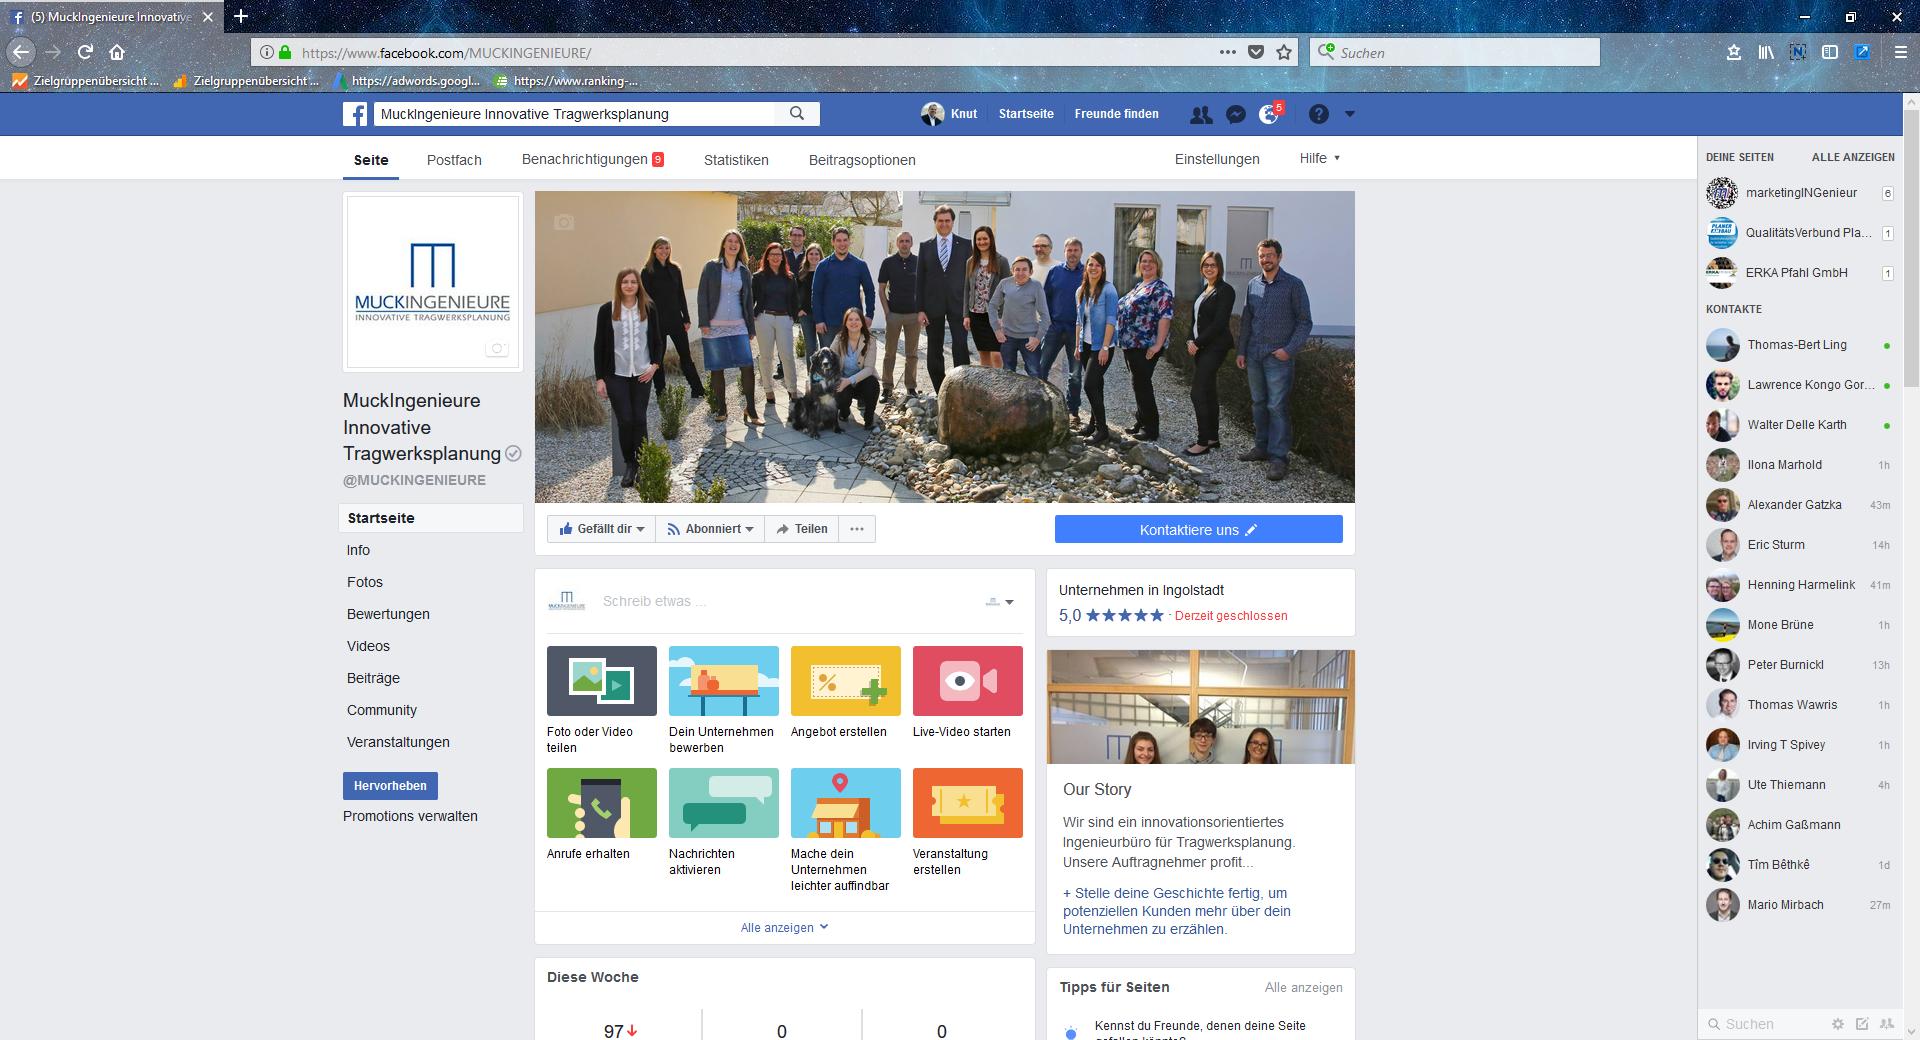 Facebook-Seite MUCKINGENIEURE